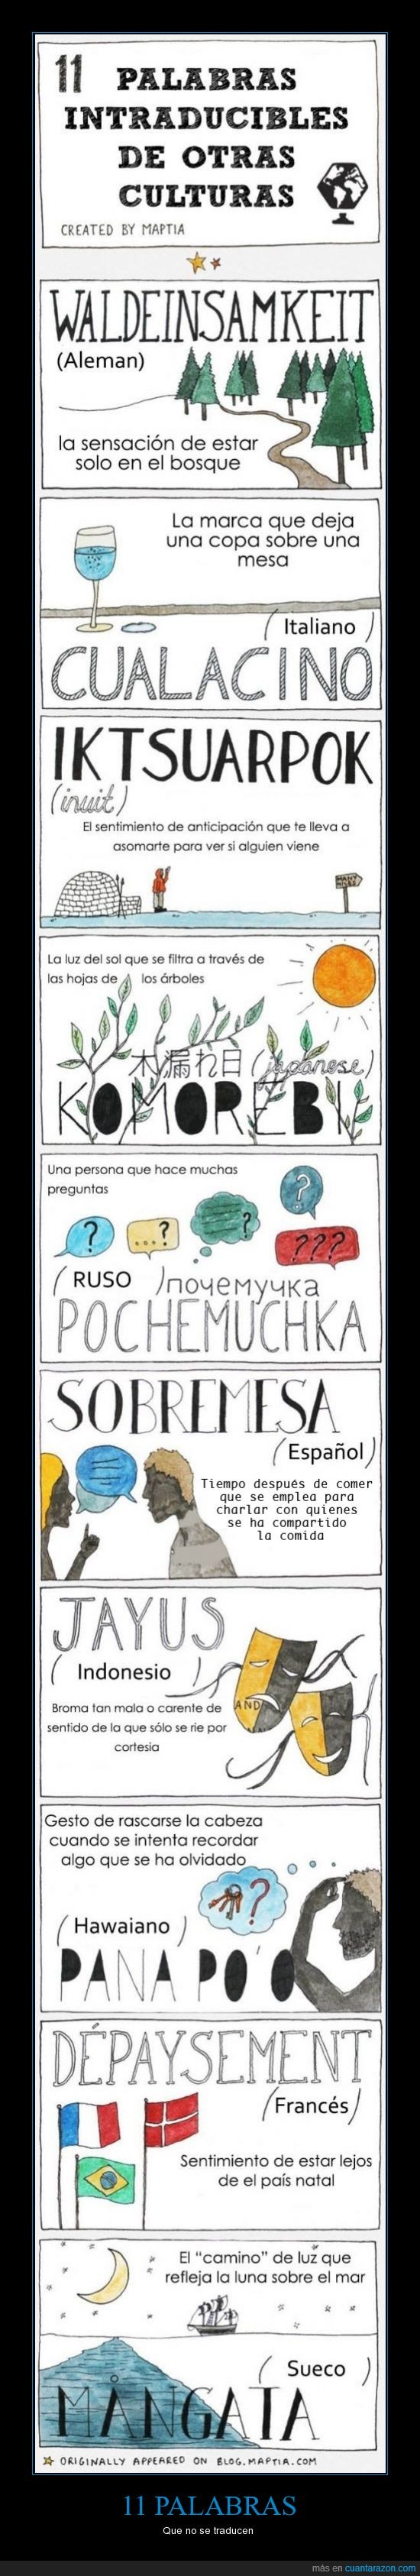 anticipa,idiomas,interesante,mirar,palabras,sobremesa,traducción